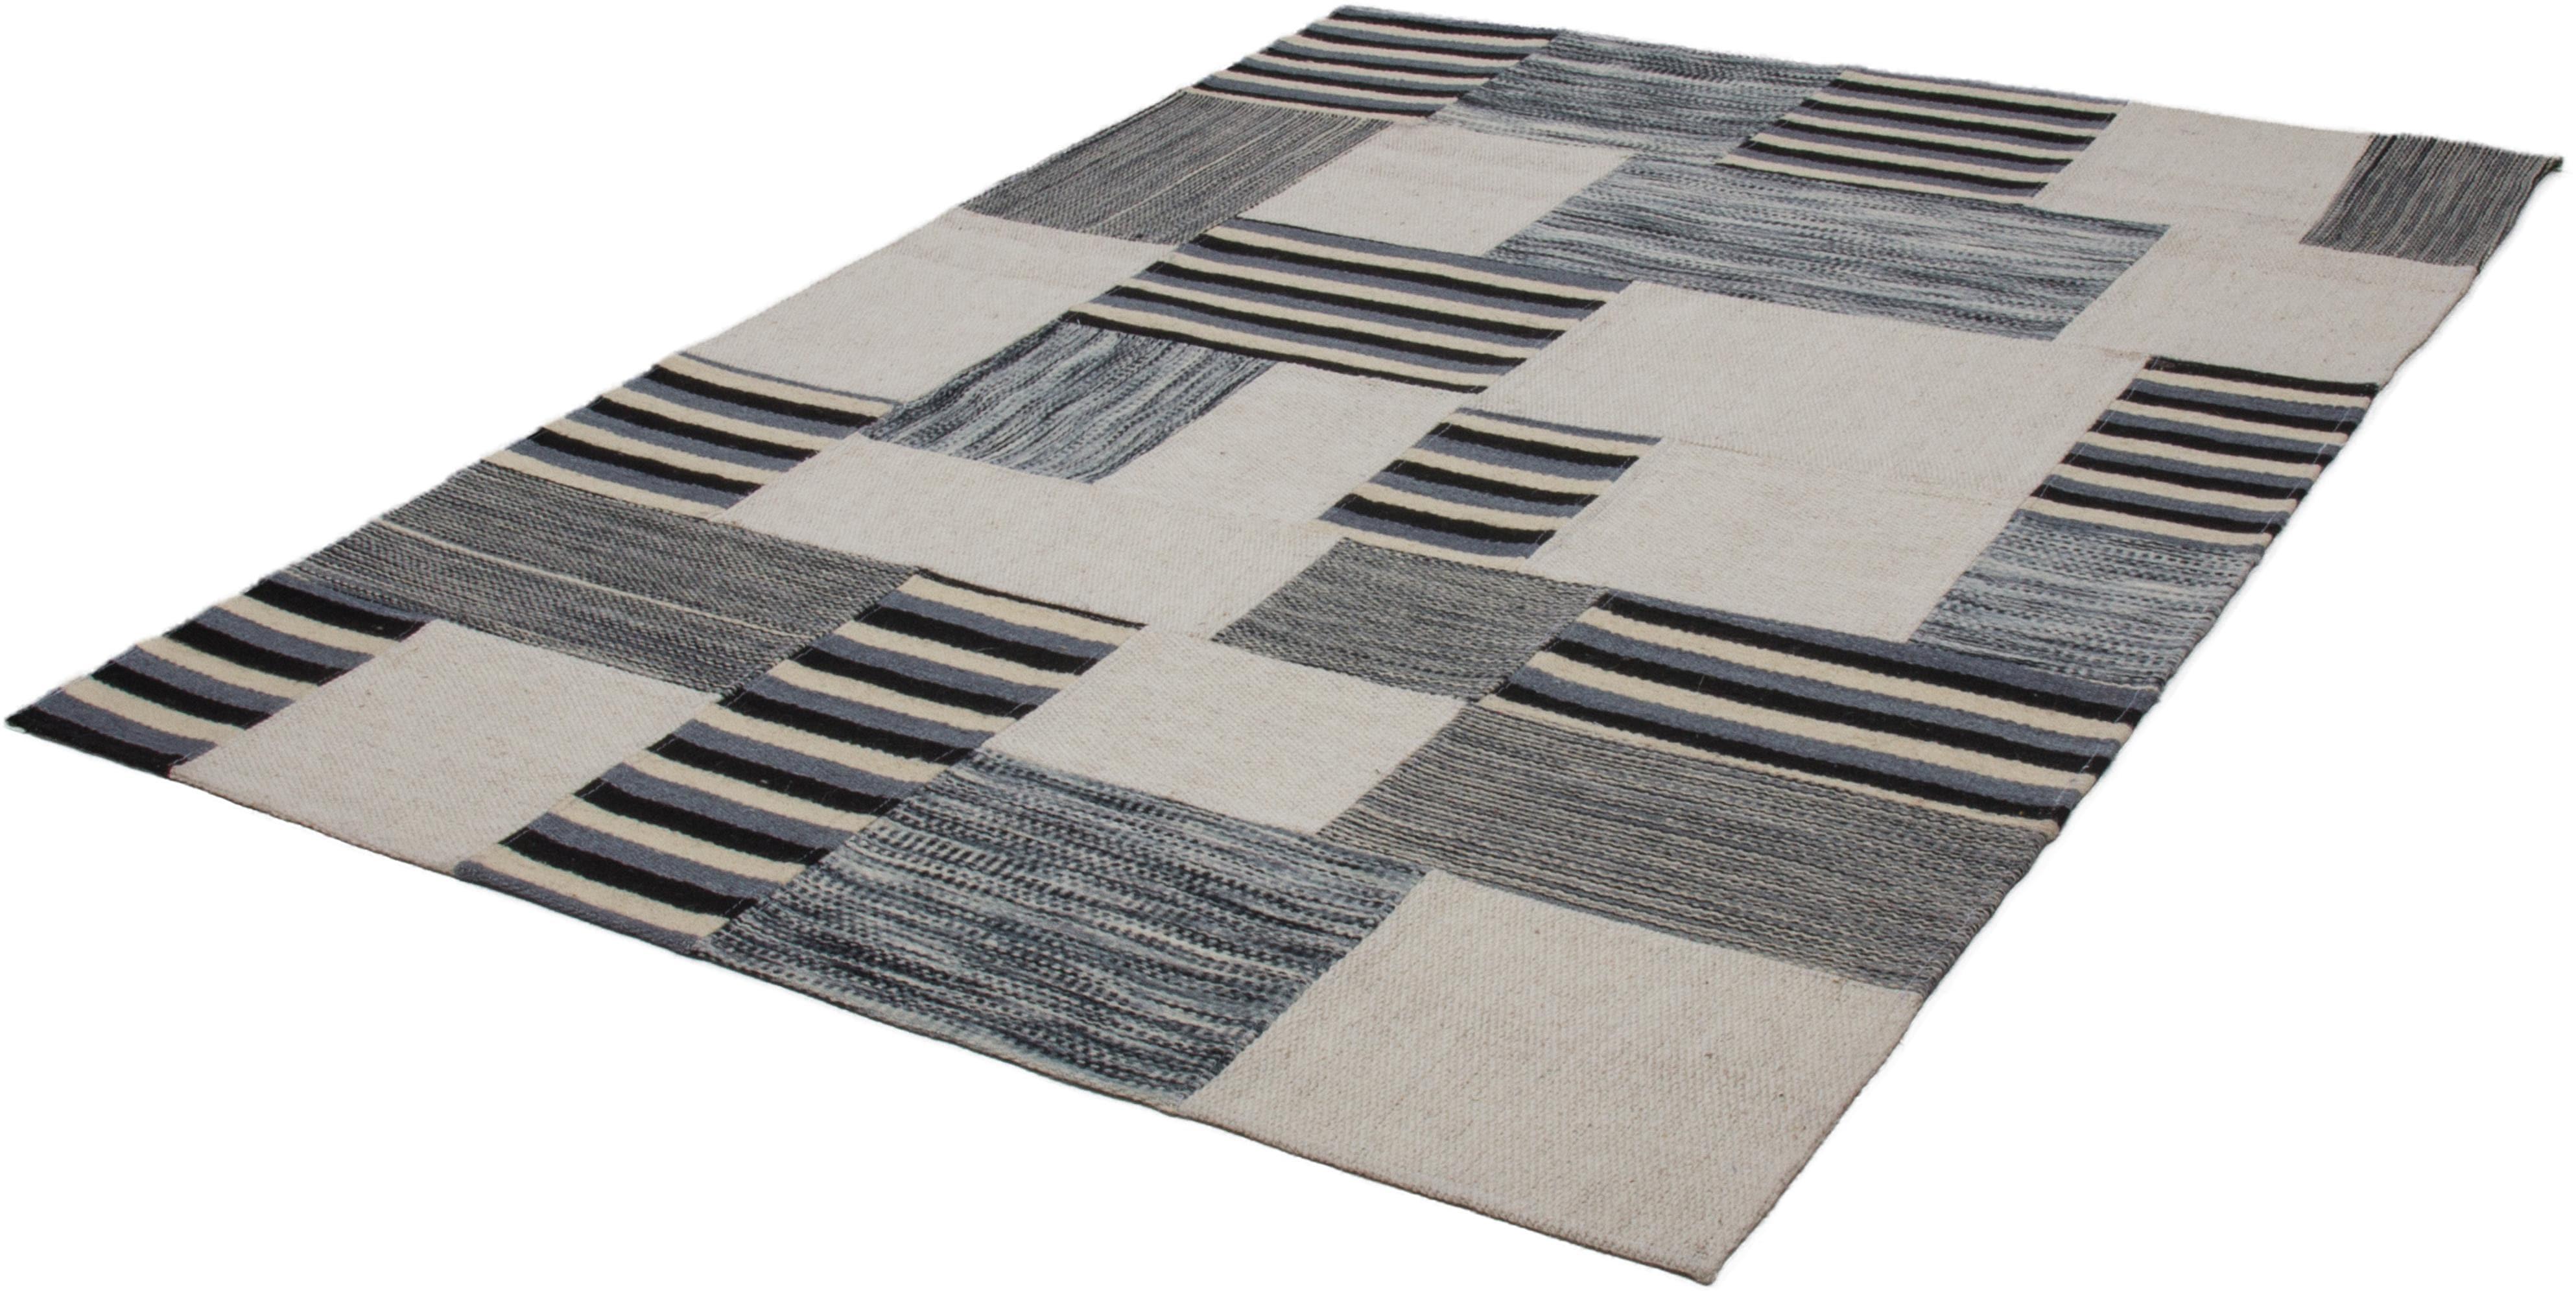 Teppich Liana 212 Kayoom rechteckig Höhe 6 mm handgewebt